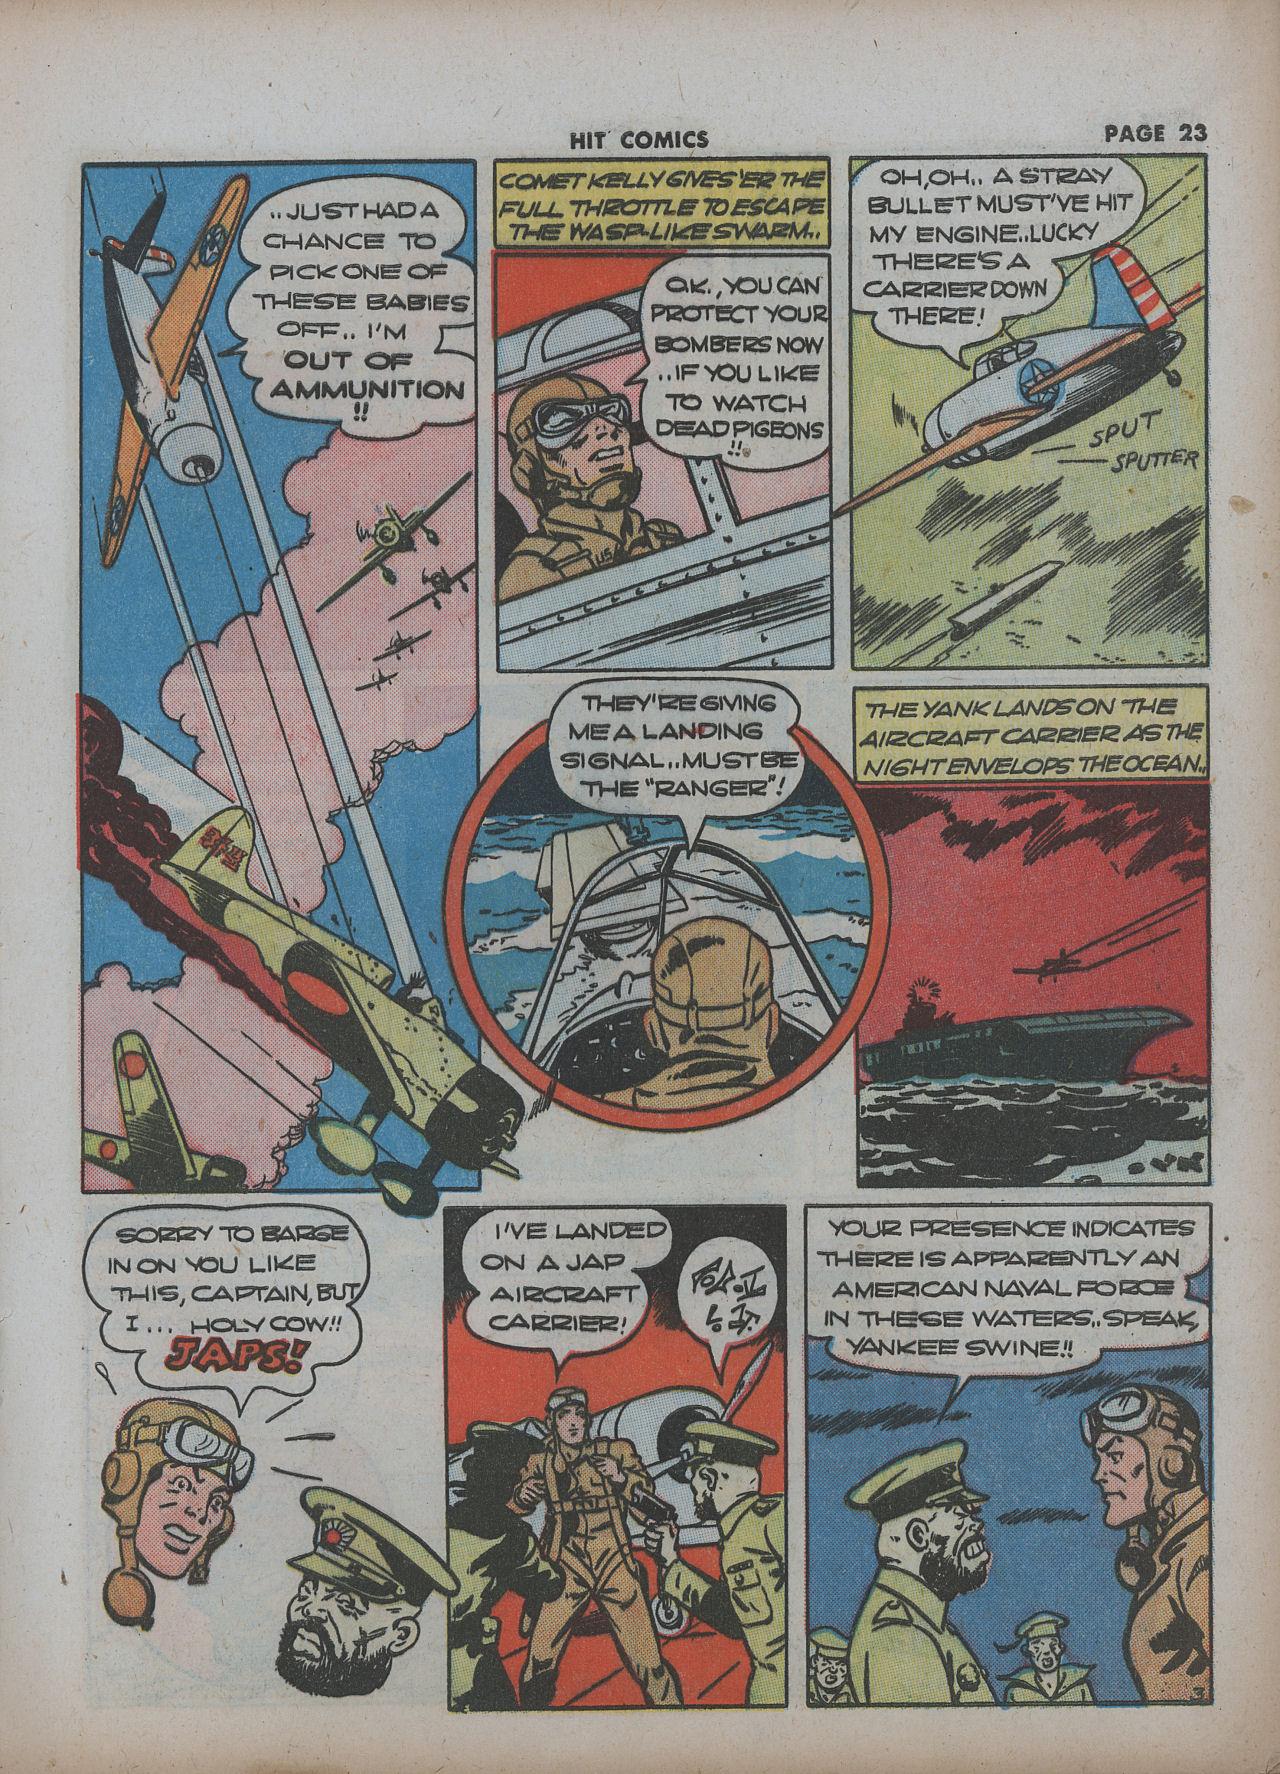 Read online Hit Comics comic -  Issue #22 - 25